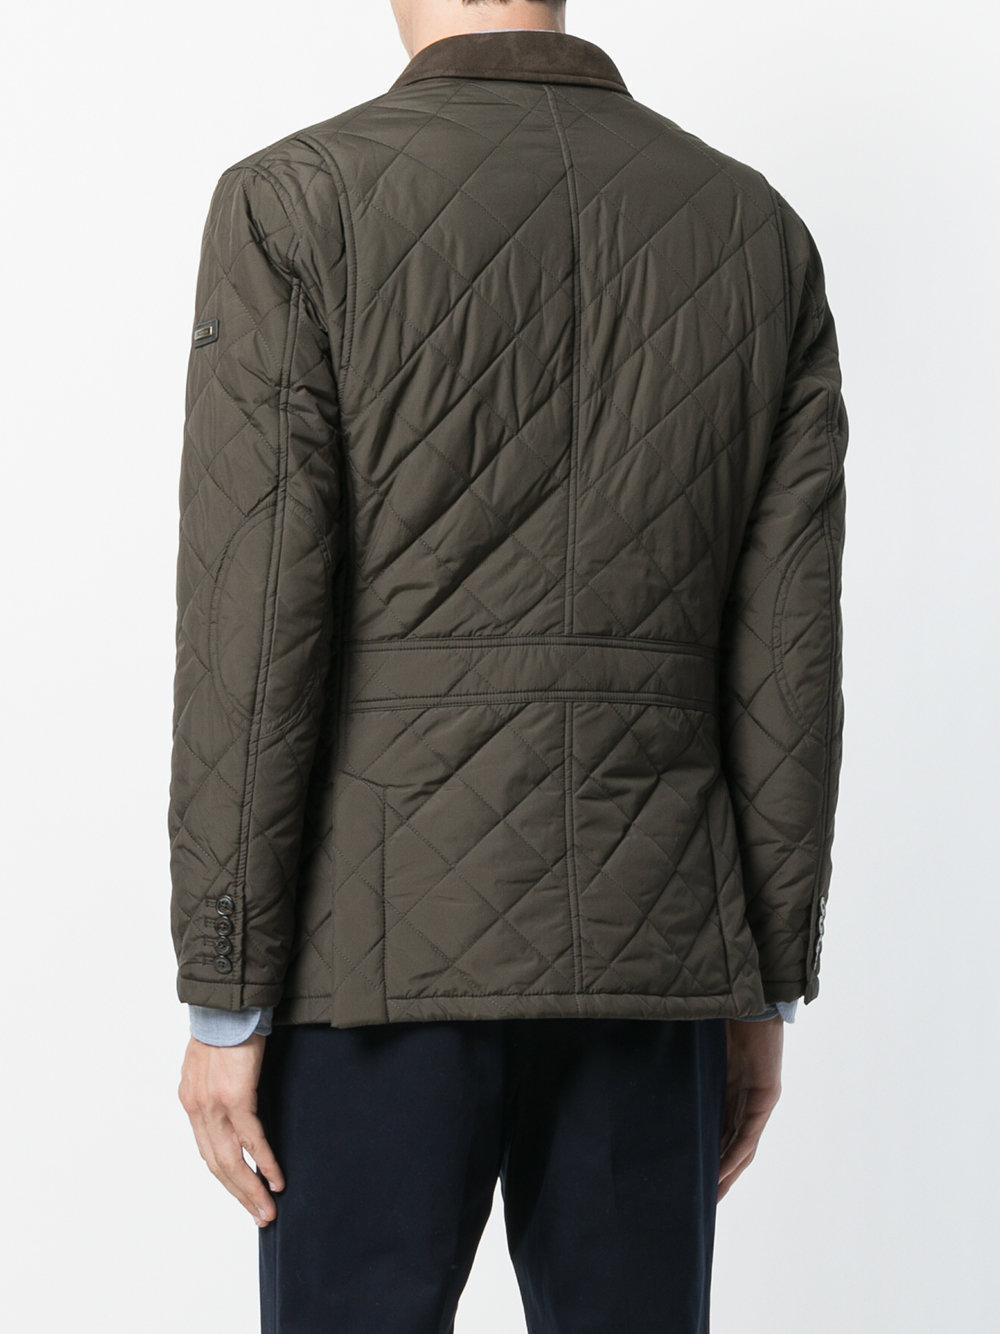 Lyst Hackett Quilted Lightweight Jacket In Green For Men